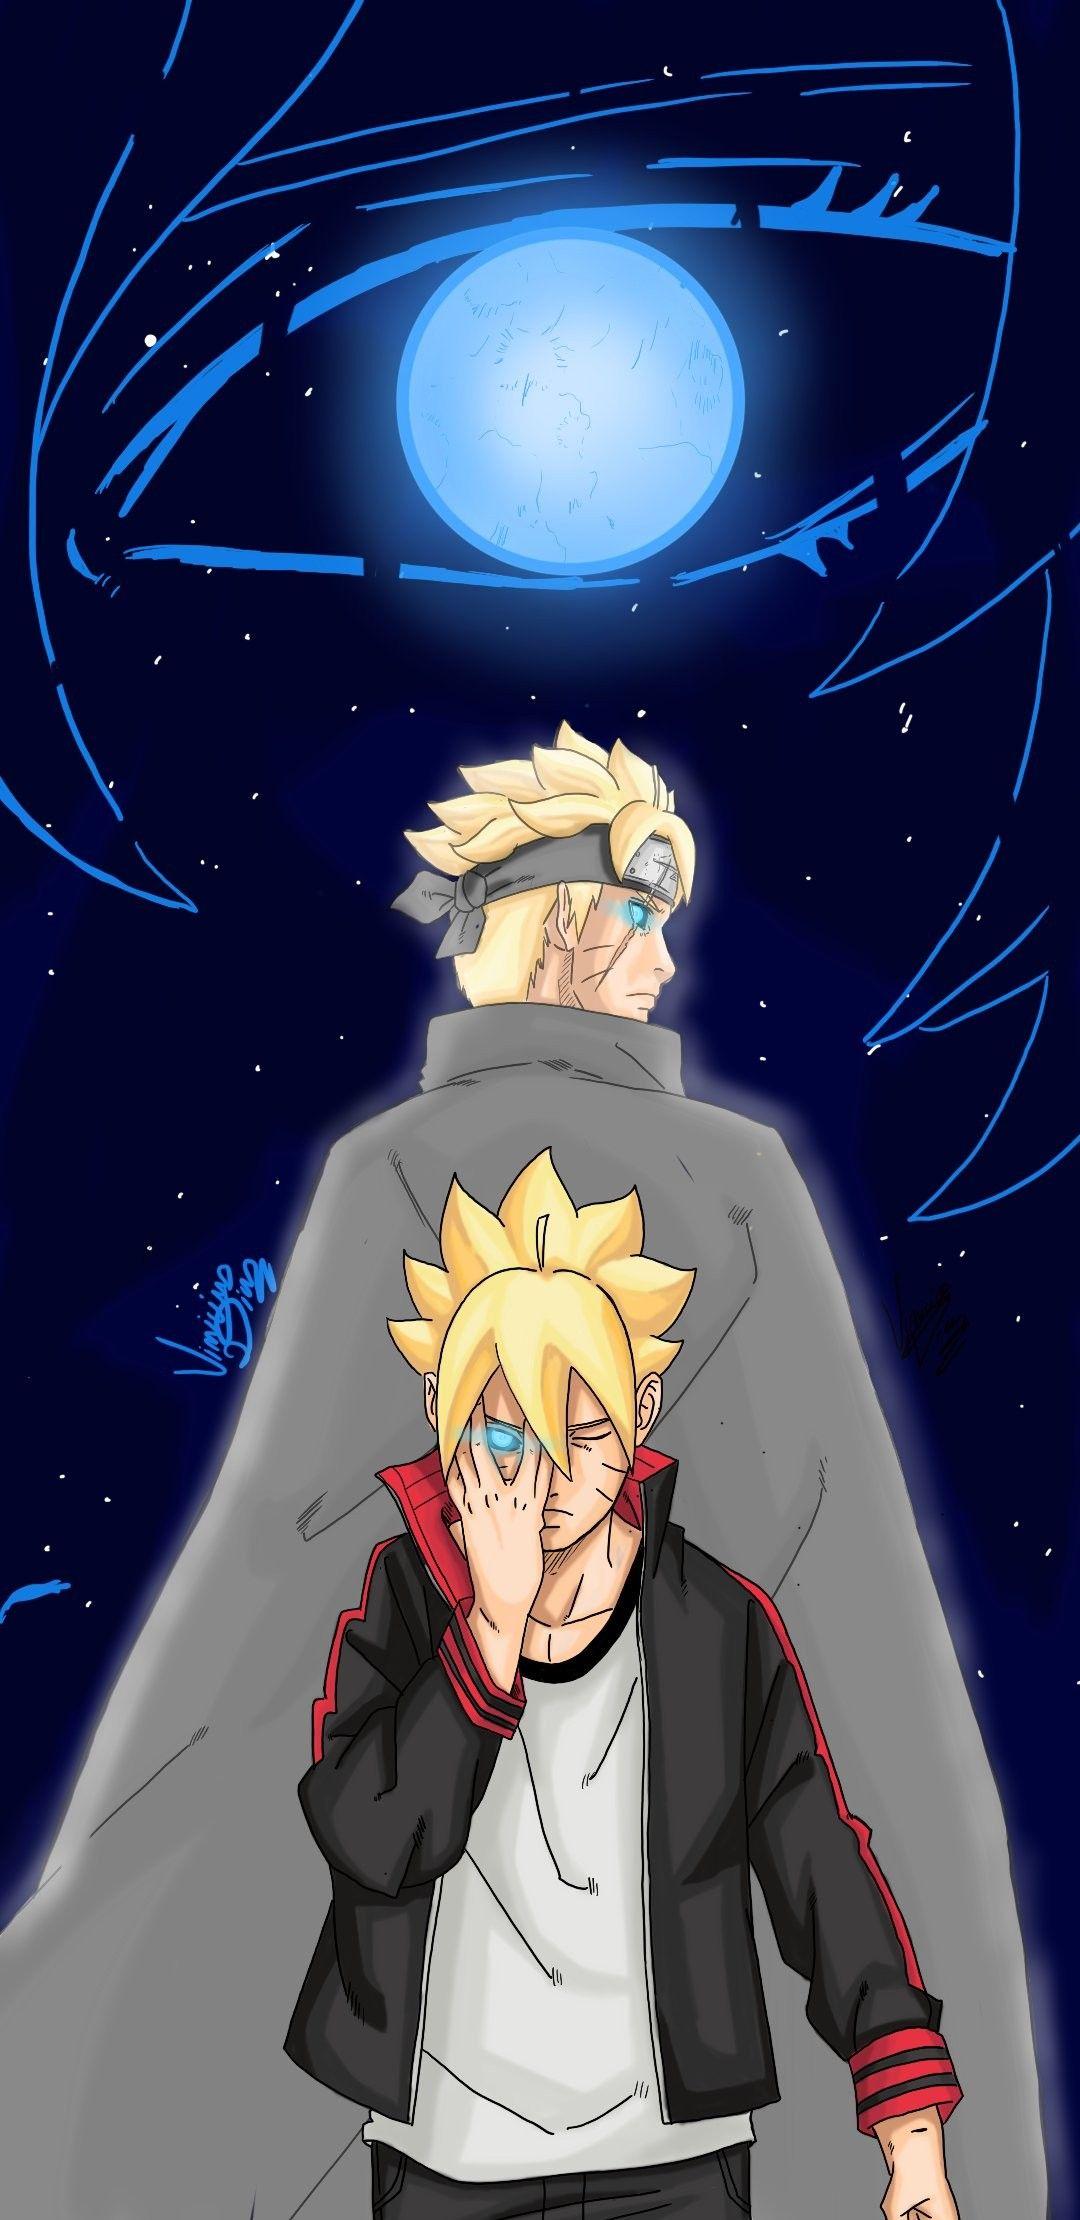 Pin Oleh Doguin Do Cabaco De Ouro Di Boruto Naruto Next Generations Lukisan Keluarga Ilustrasi Komik Gambar Karakter